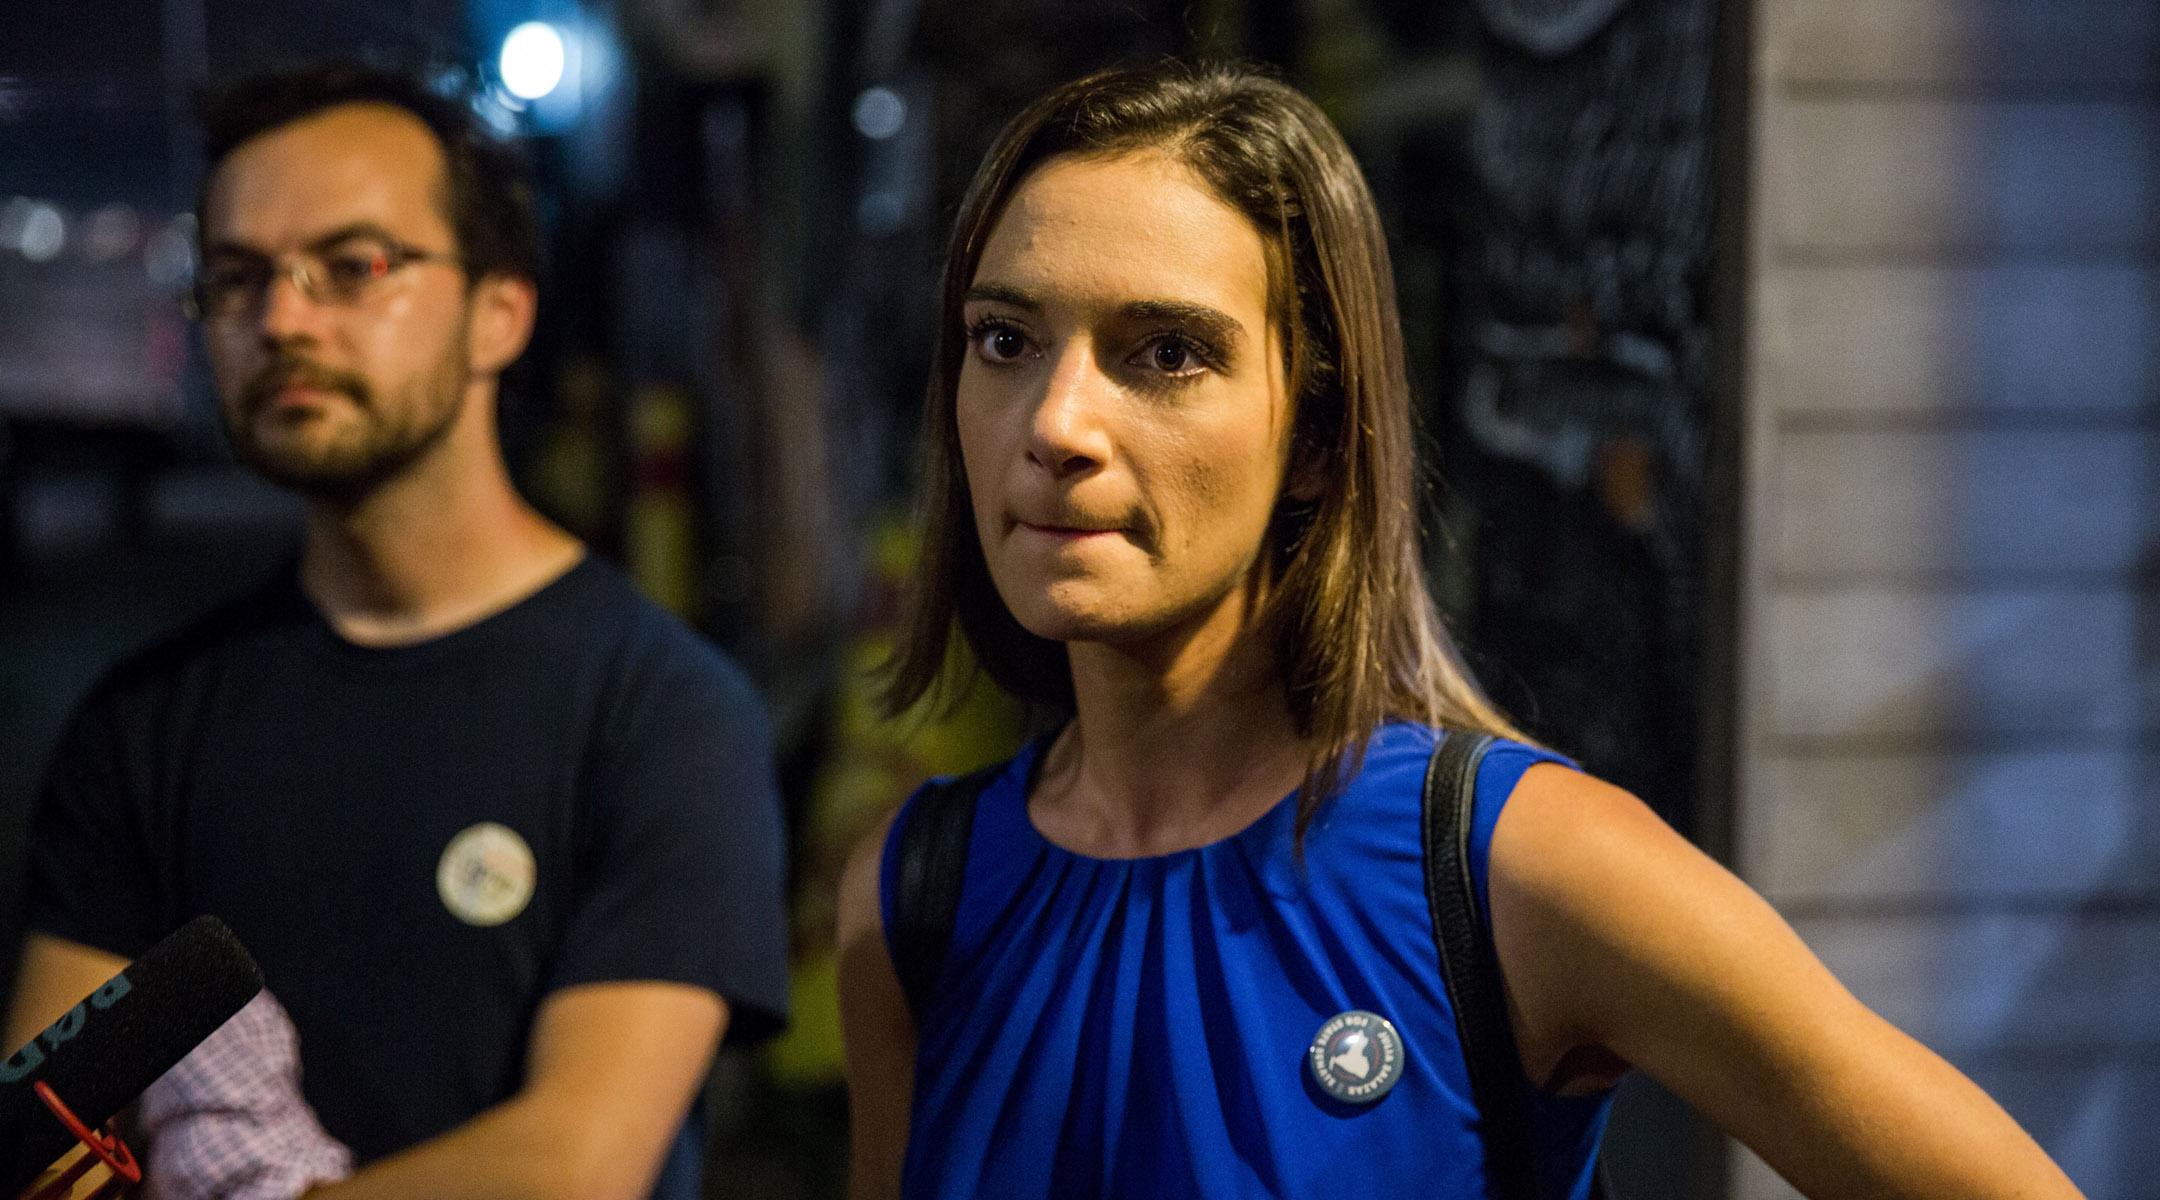 Julia Salazar